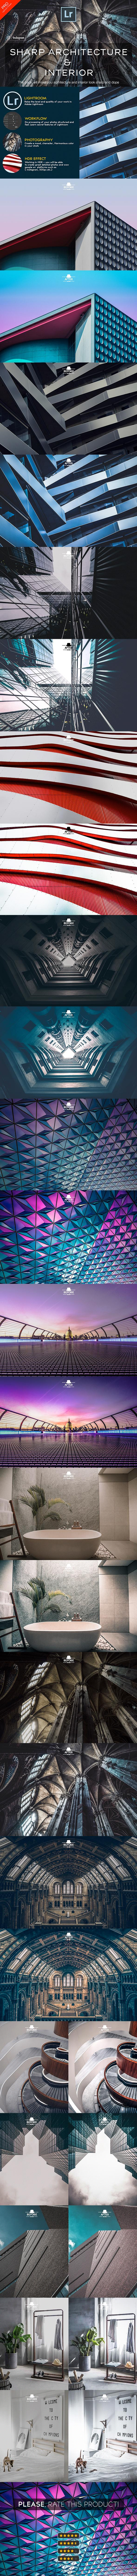 GraphicRiver Architecture Lightroom Presets 21170587